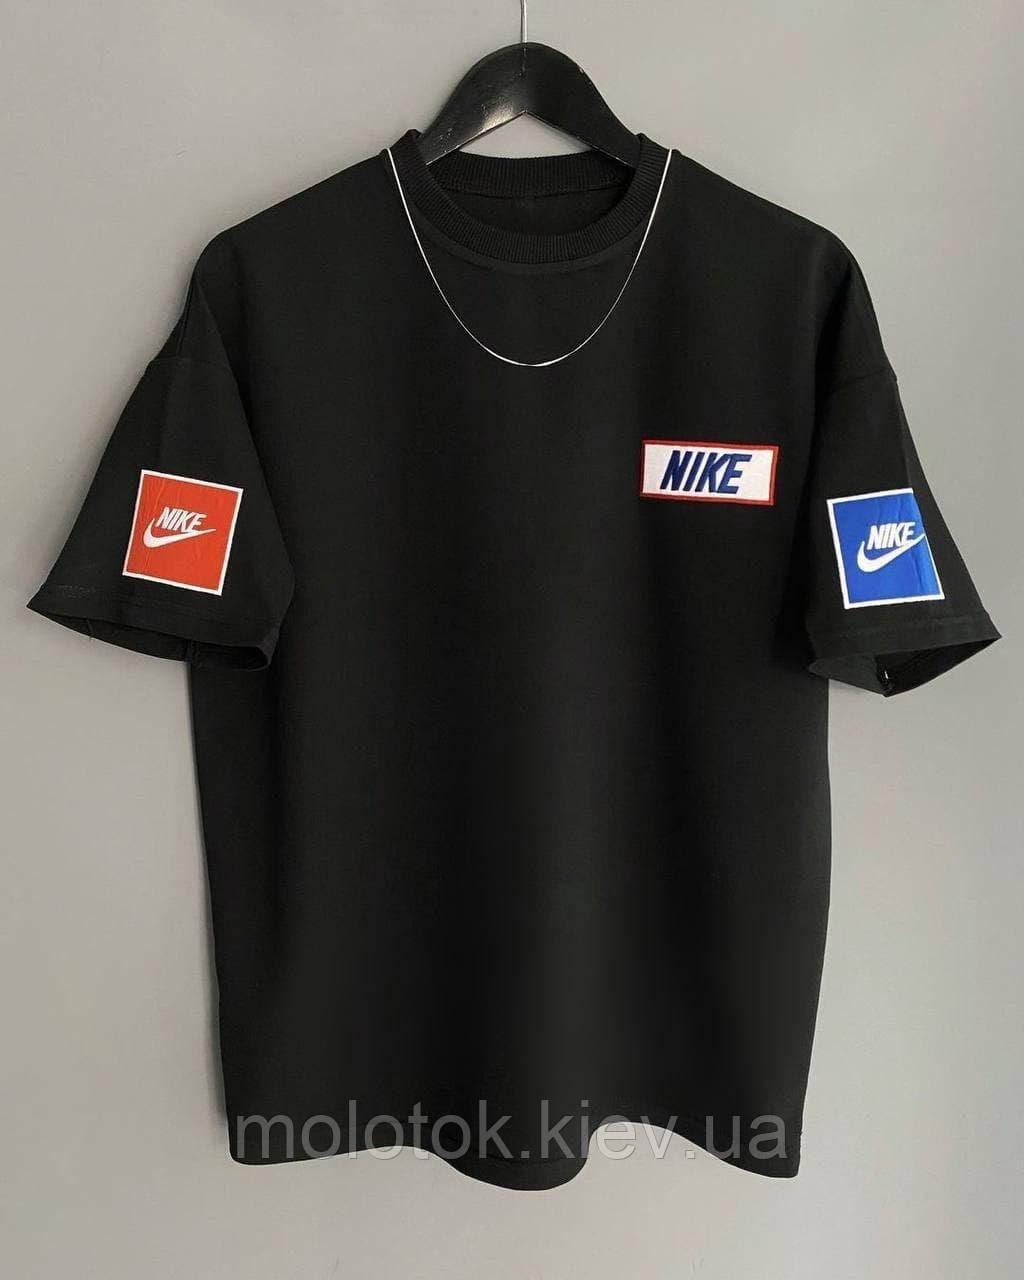 Мужская футболка Nike черная Турция